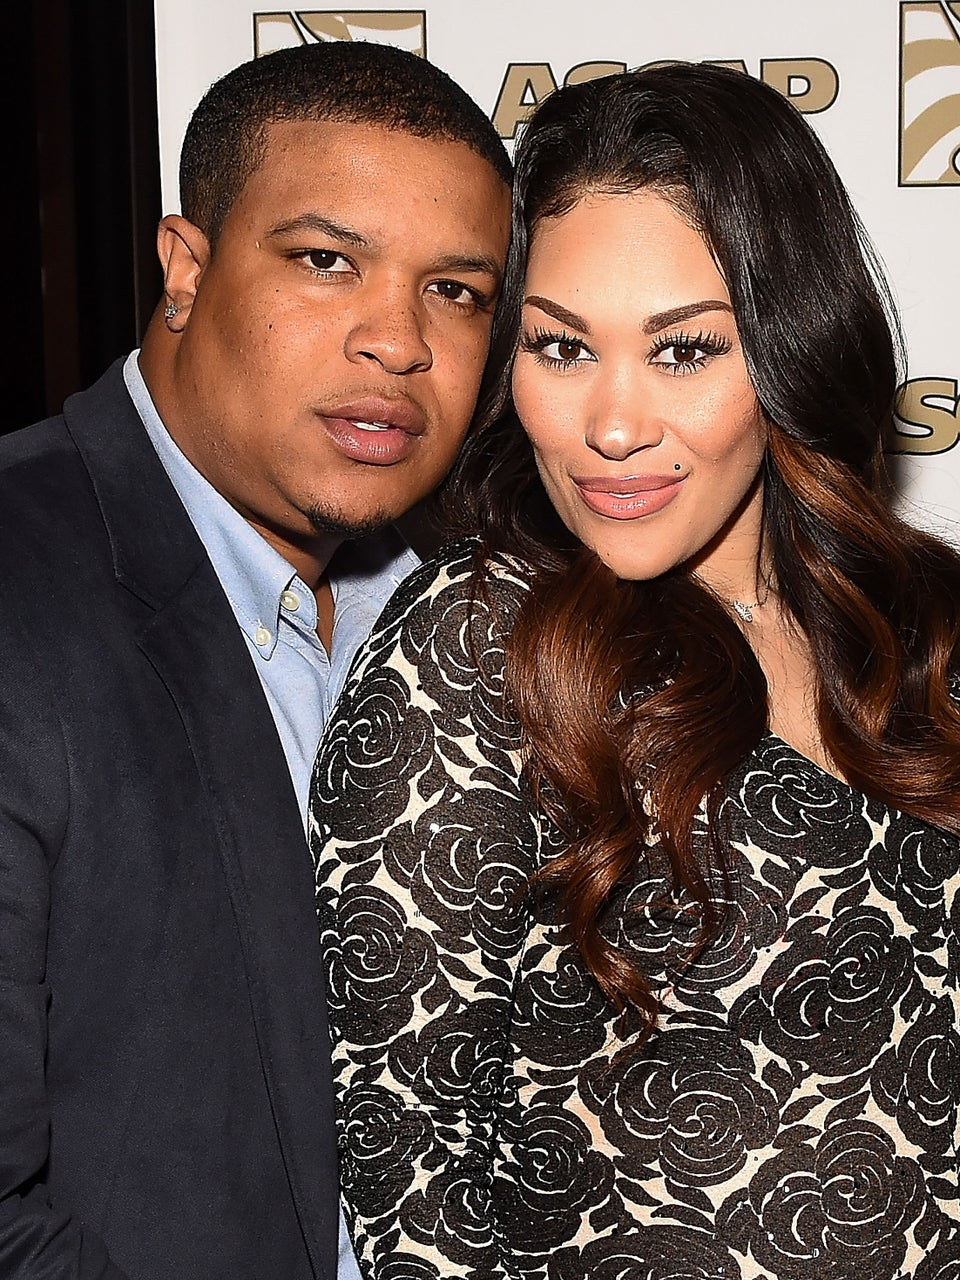 Whoa! Pregnant KeKe Wyatt Says Her Husband Wants A Divorce and Called Her 'An Emotional Wreck'